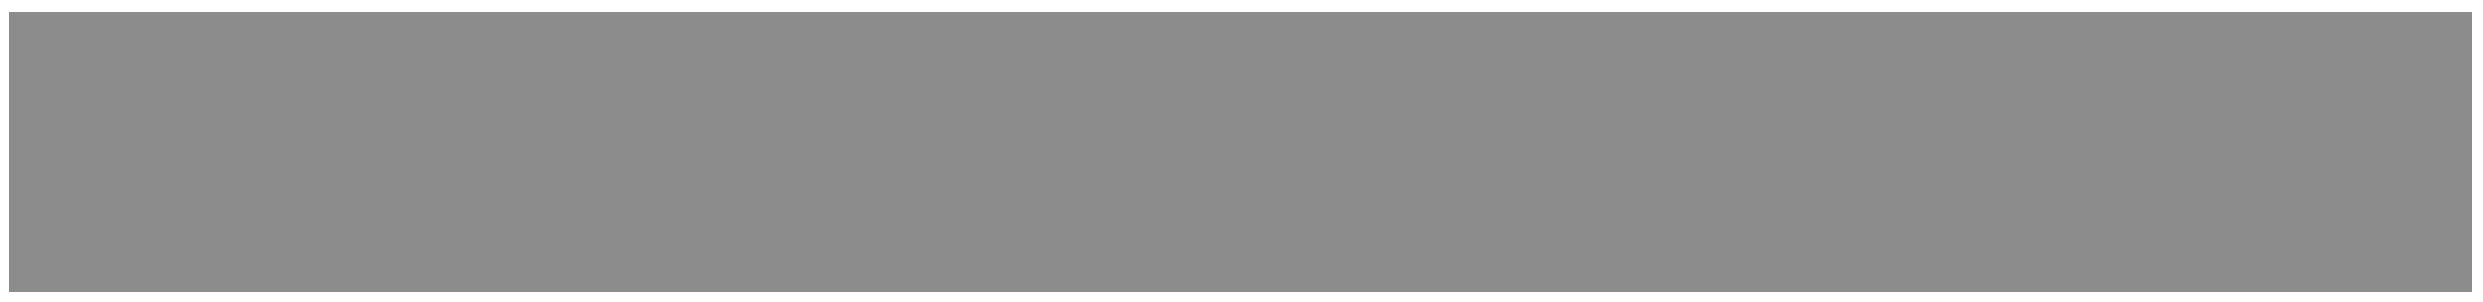 ceramica bardelli logo